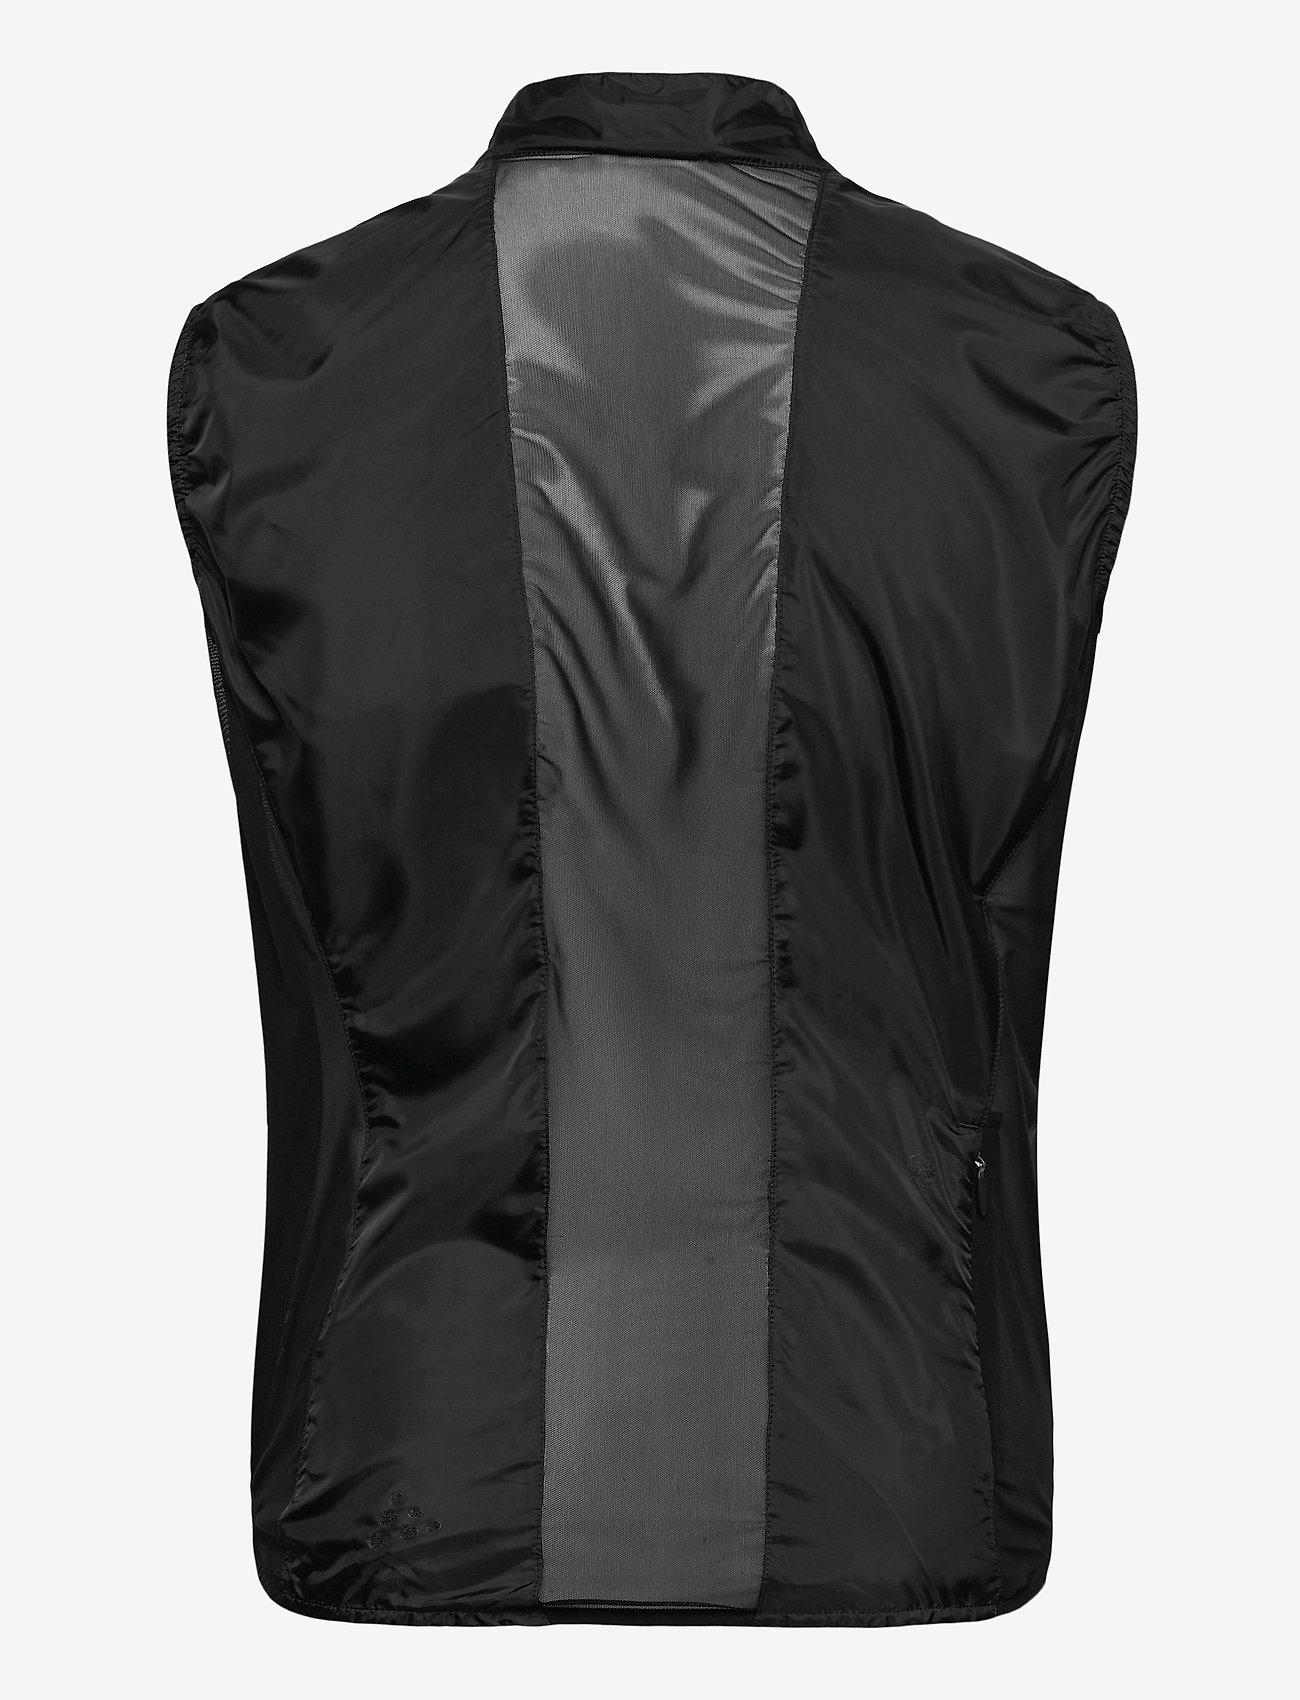 Craft - Essence Light Wind Vest M - træningsjakker - black - 1